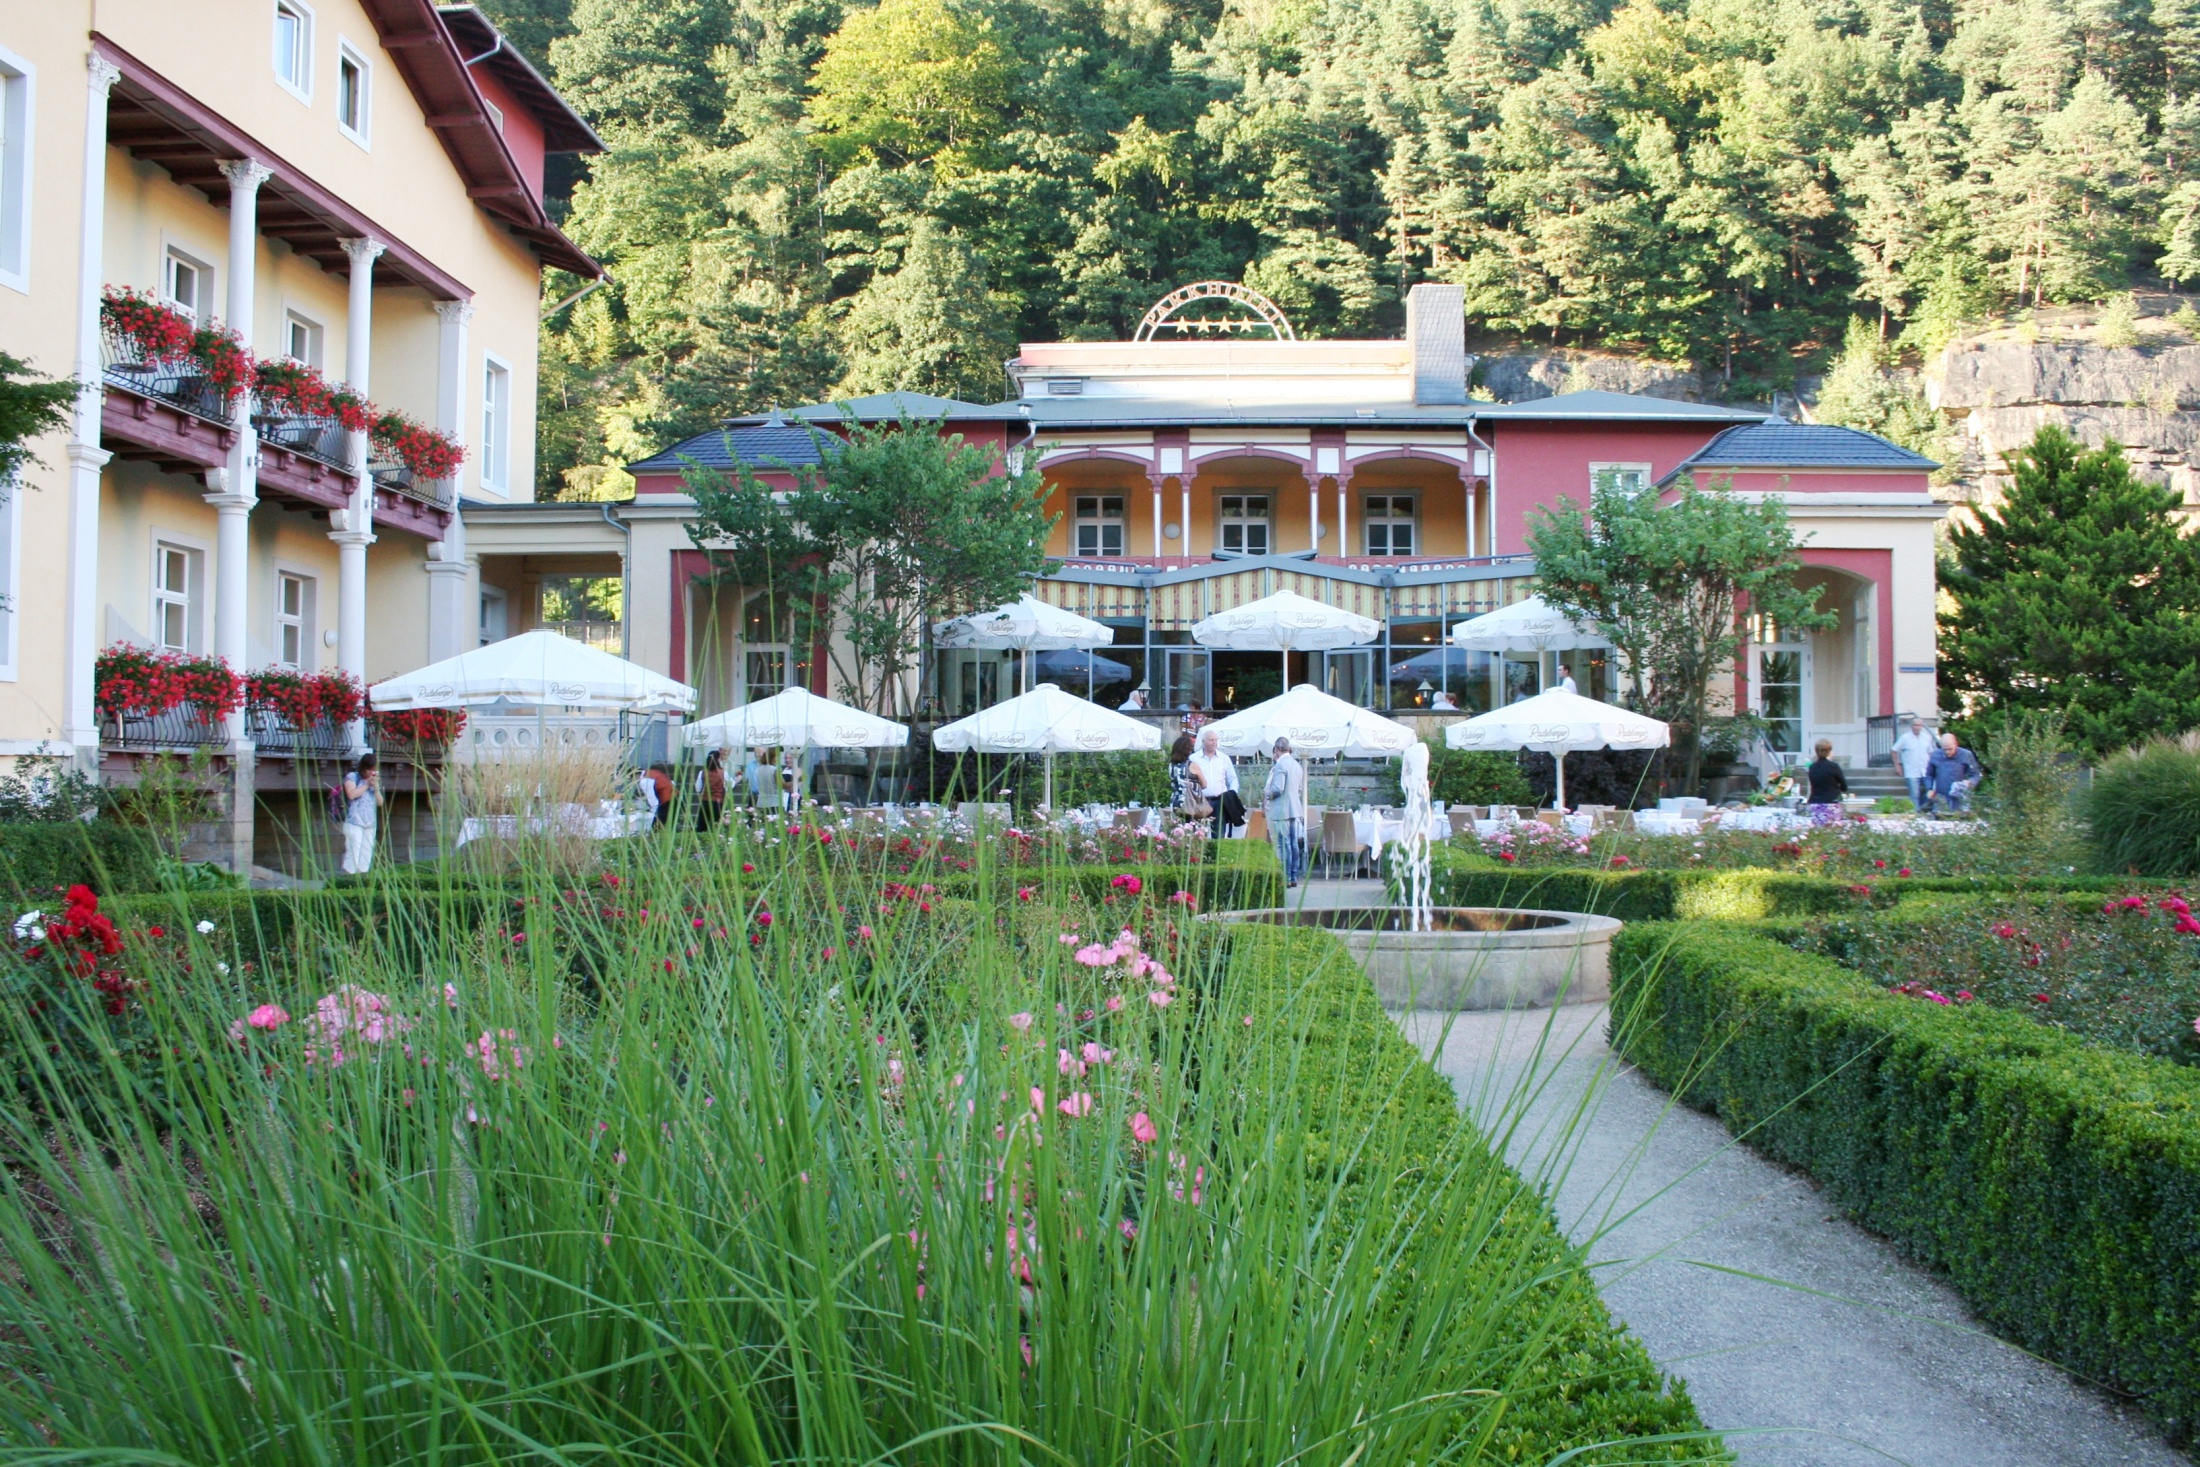 Pura Hotel Bad Schandau